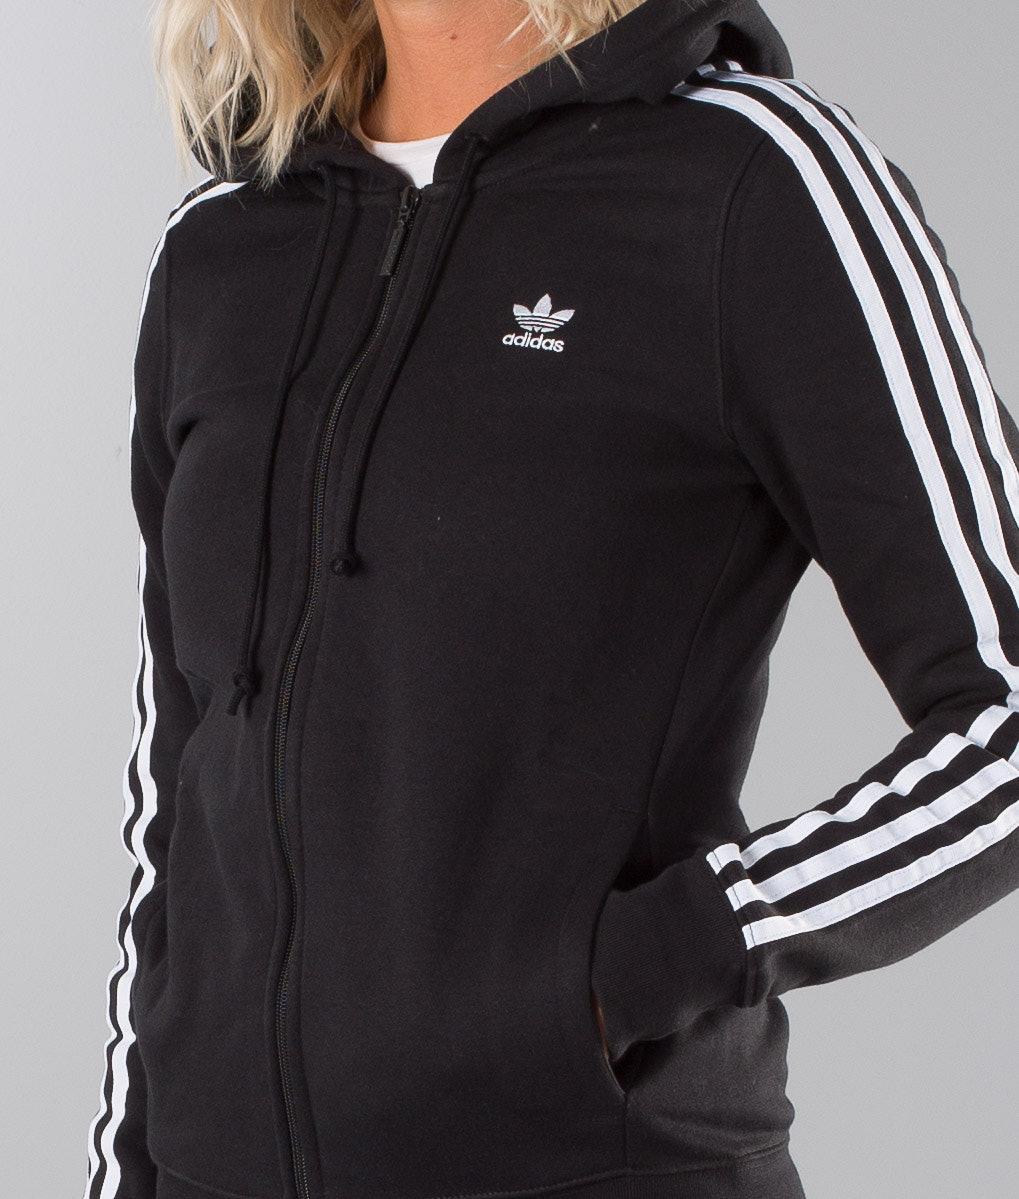 cb7d3c0b Adidas Originals 3Stripe Hoodie Black